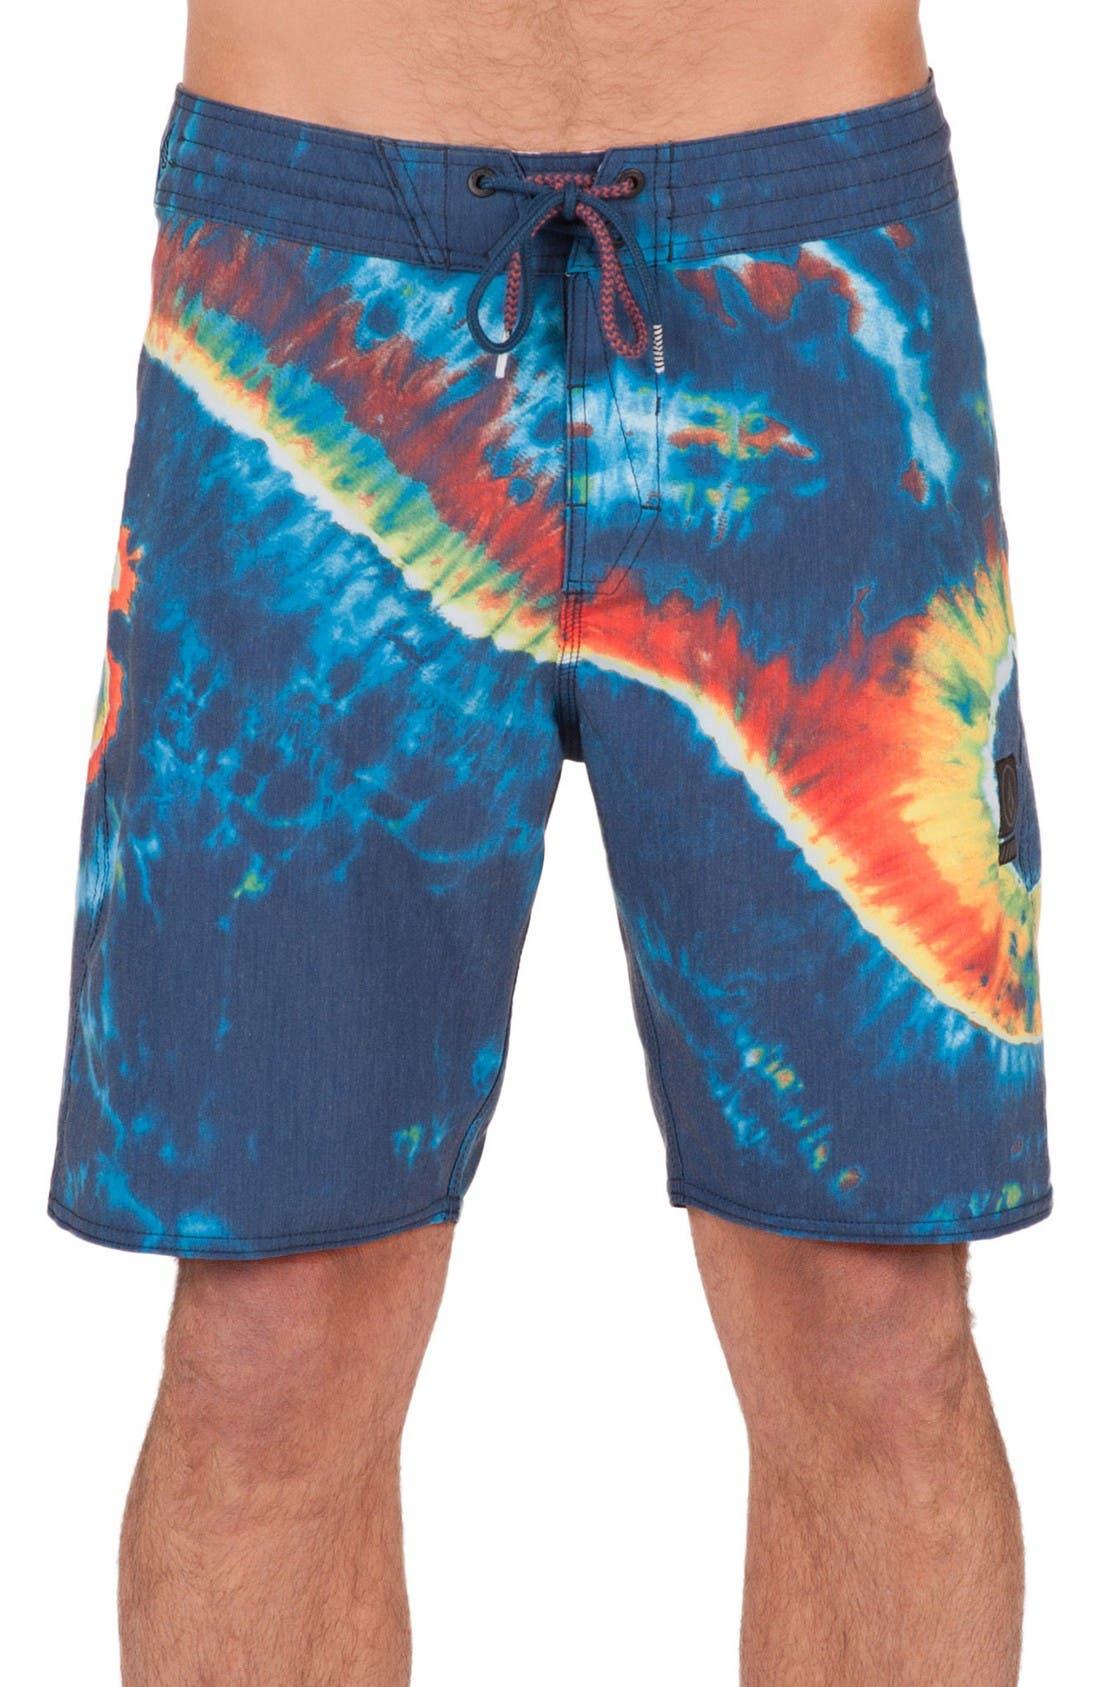 Alternate Image 1 Selected - Volcom Yin Yang Slinger Board Shorts